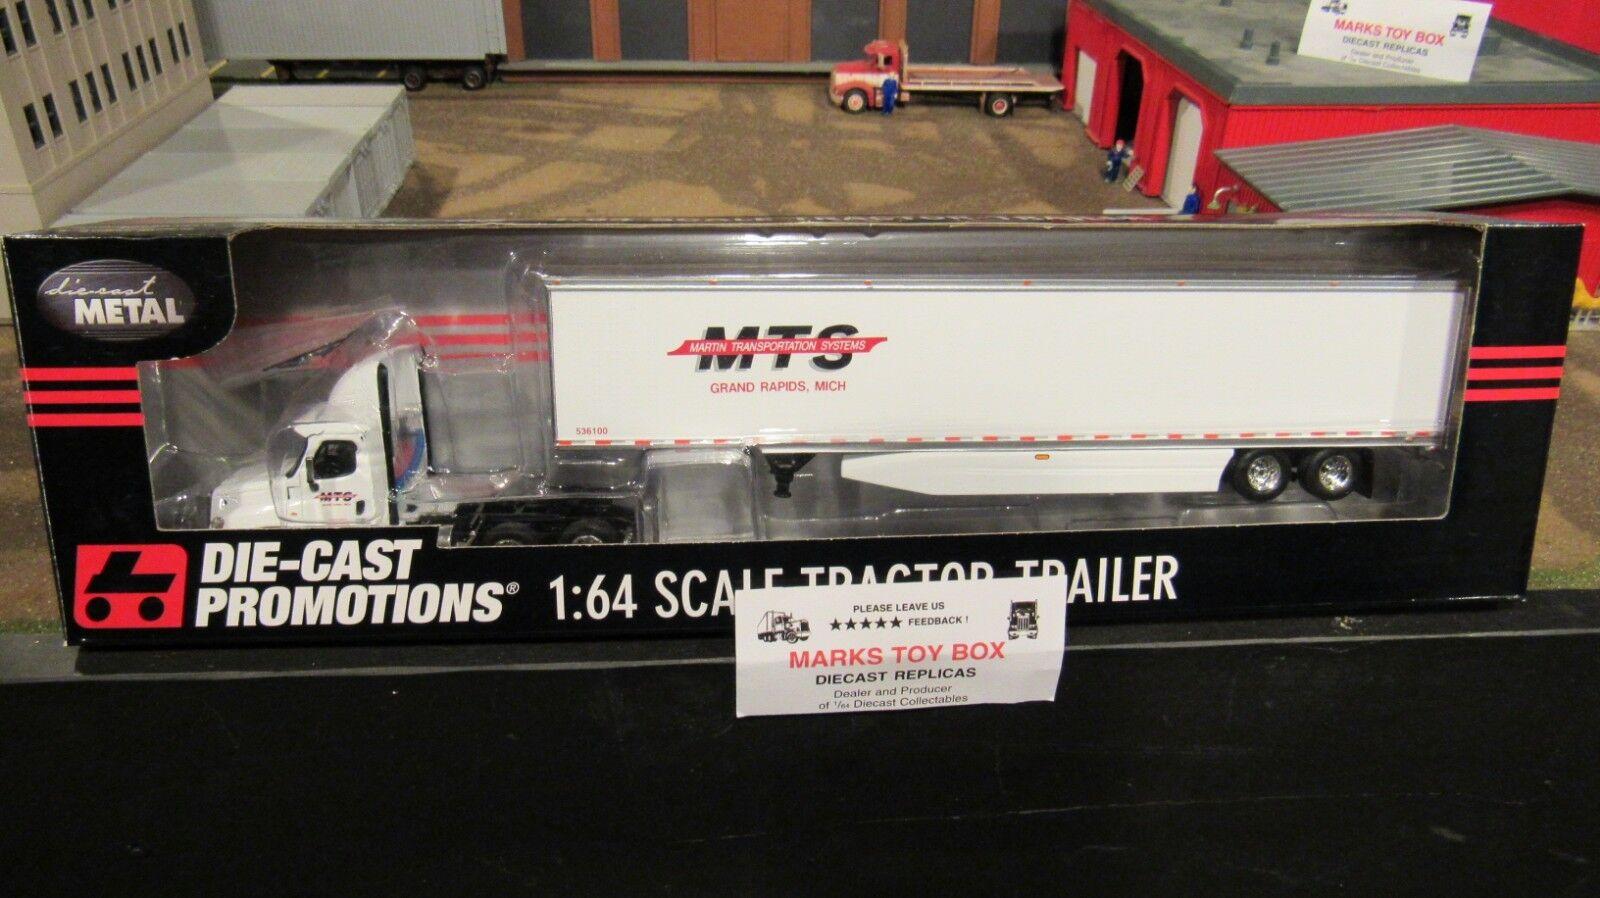 DCP 33587 Martin Transportation Systems MTS FL Casia sec Remorque 1 64 CL